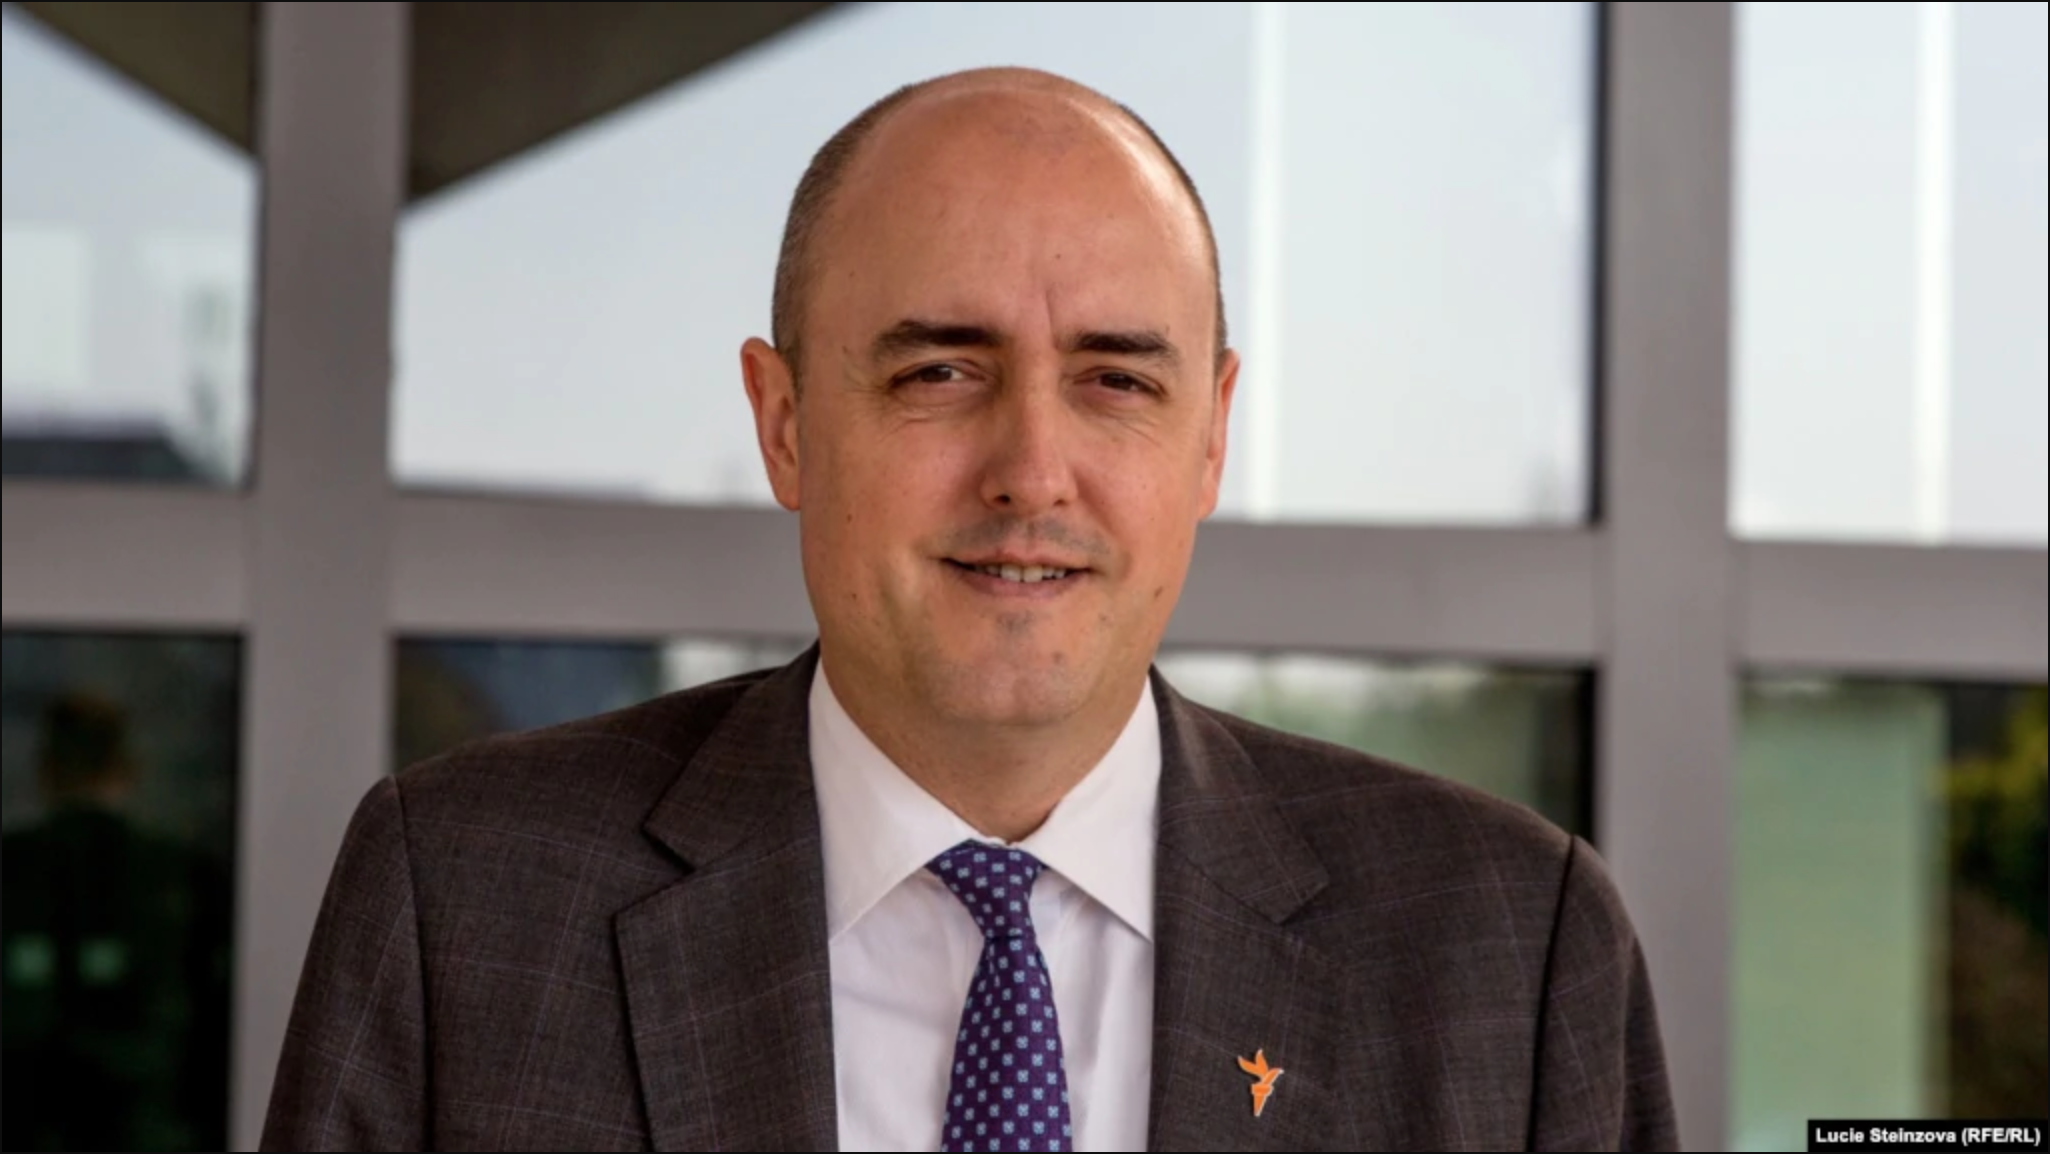 RFE/RL welcomes back Jamie Fly as president